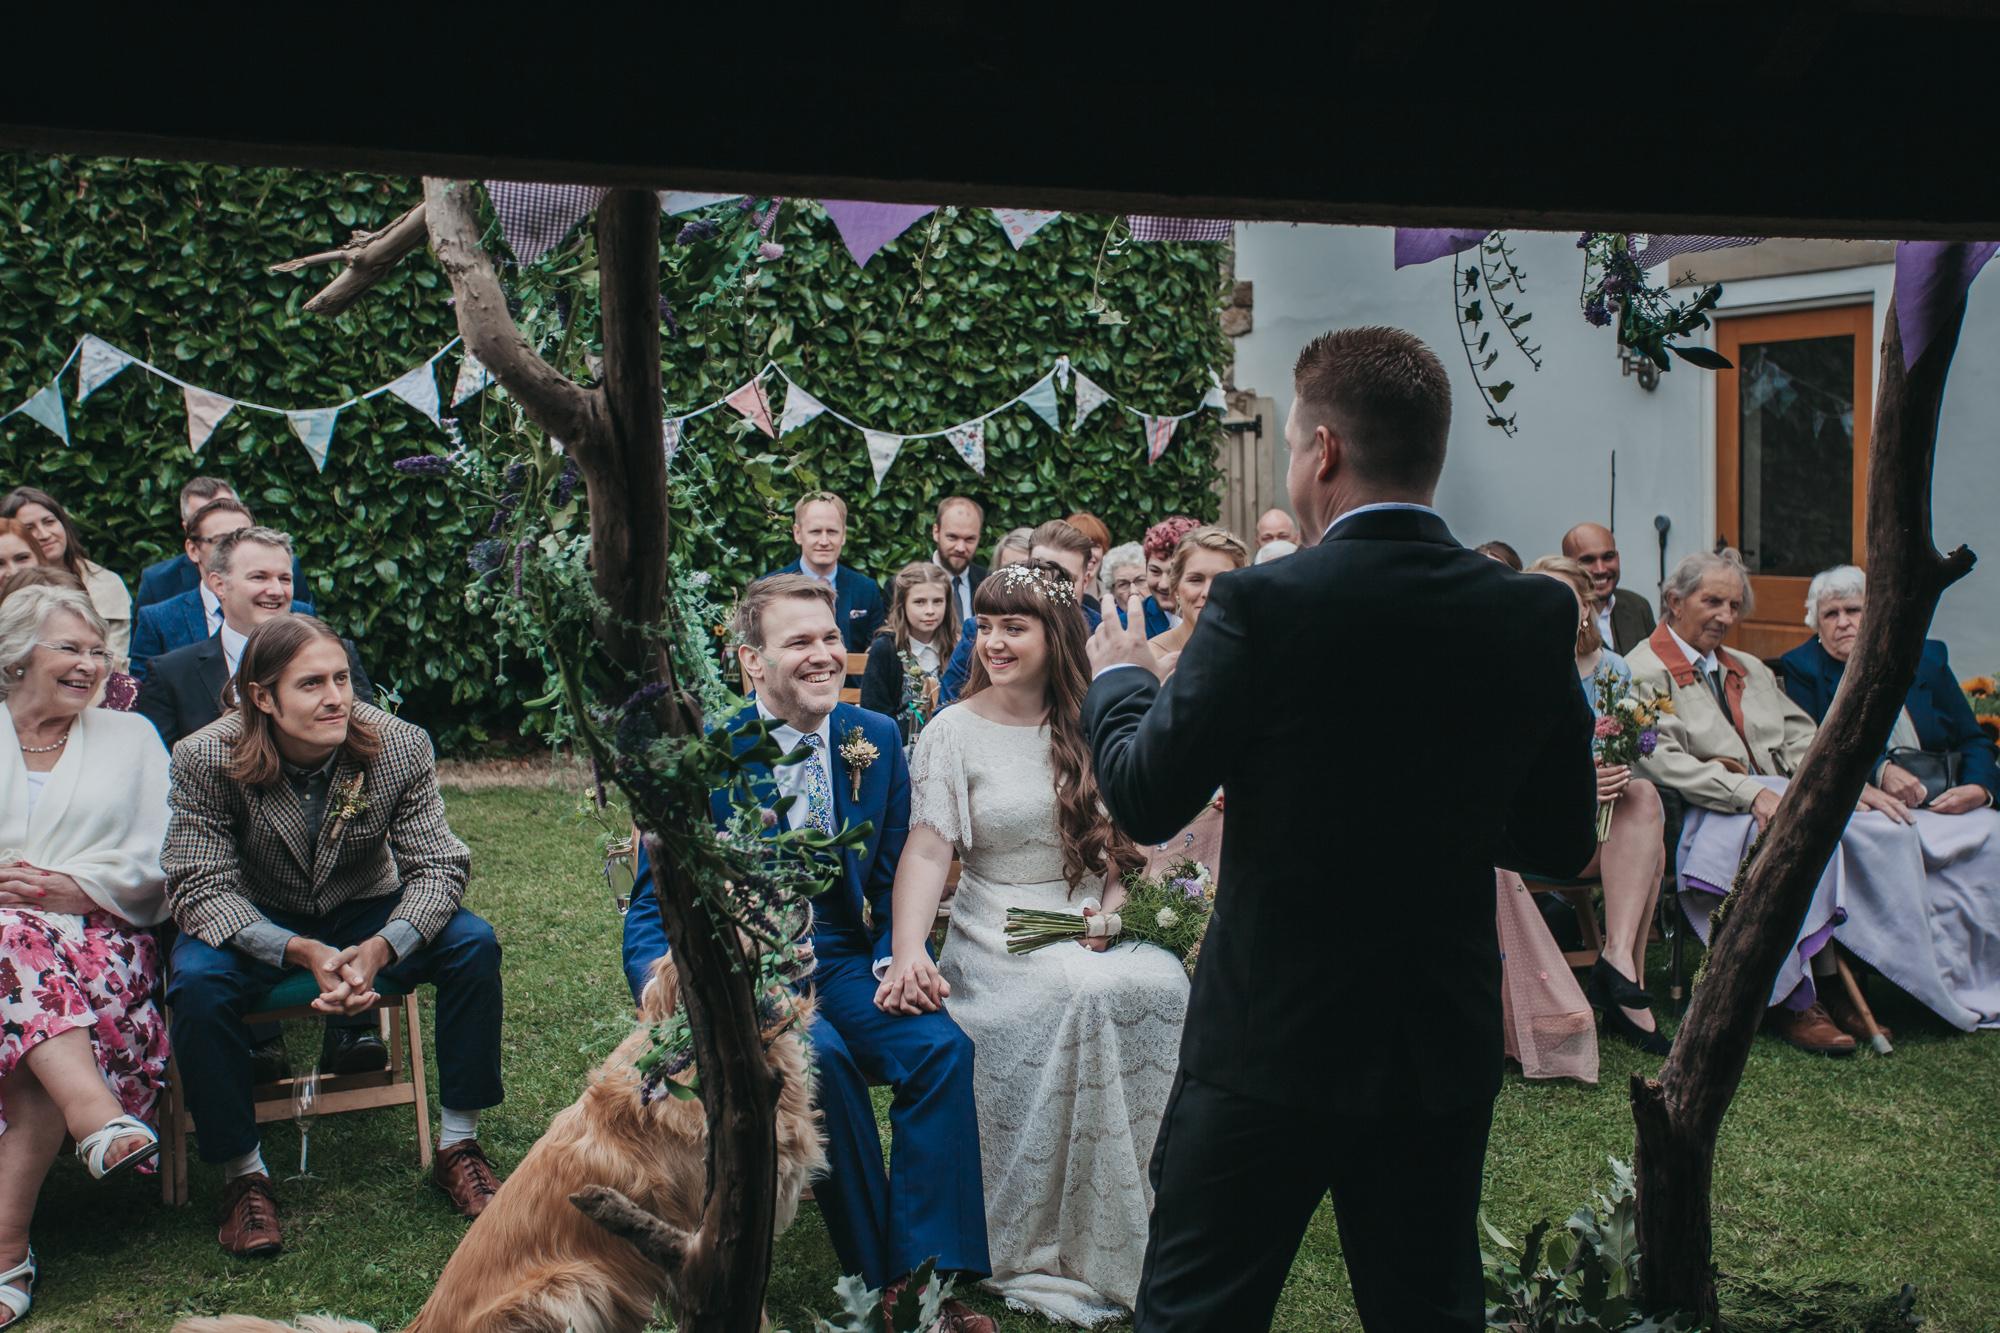 Kristy-Back-Garden-Outdoor-Wedding-Sheffield-Industrial-Warehouse-Wedding-Bohemian-Kate-Beaumont-Dahlia-Dress-11.jpg